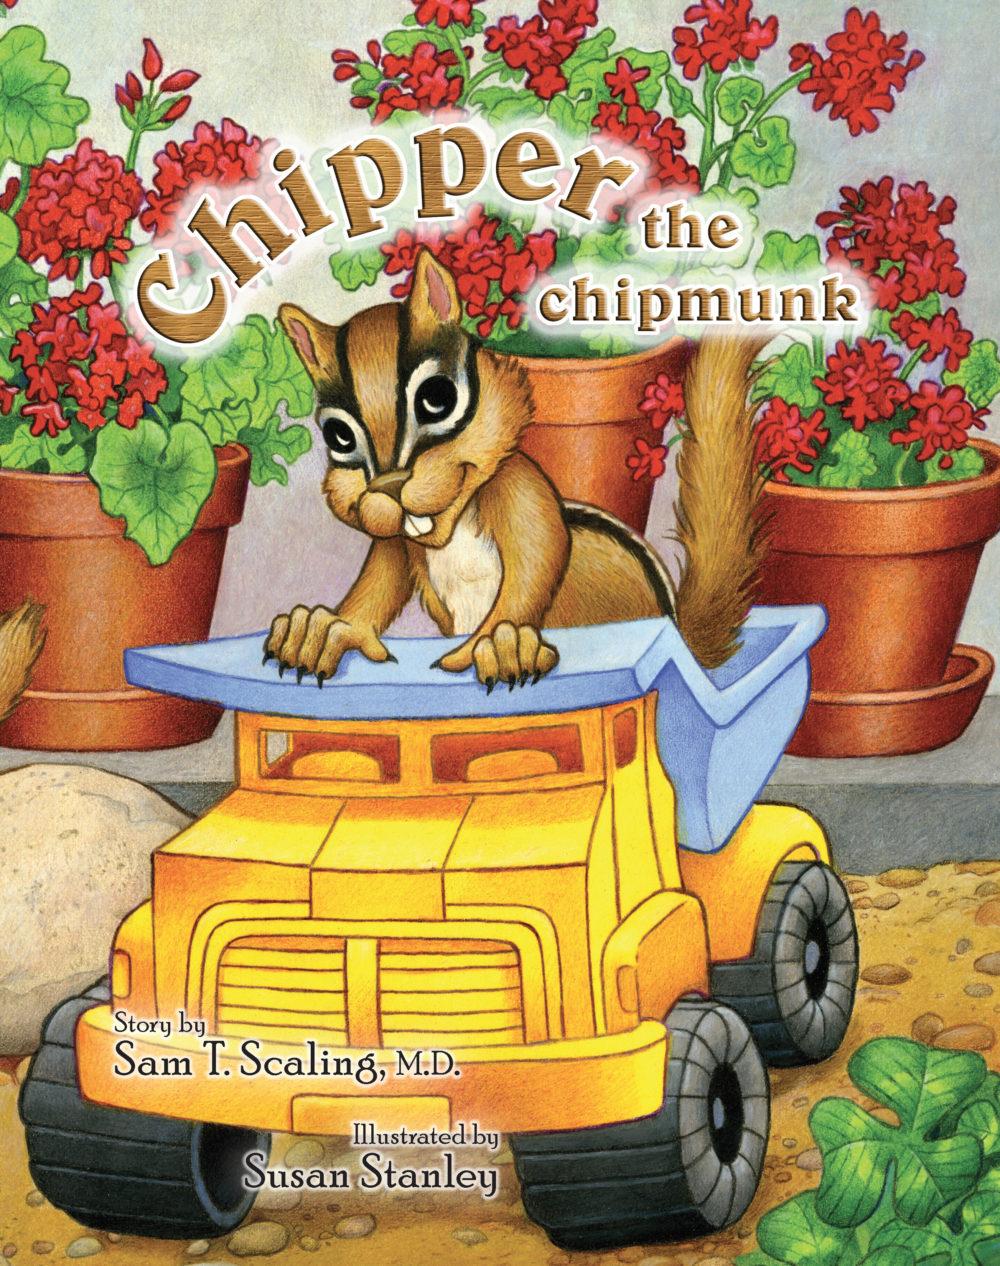 Chipper the Chimpmunkhttps://www.endeavorbooks.com/product/chipper-the-chipmunk/